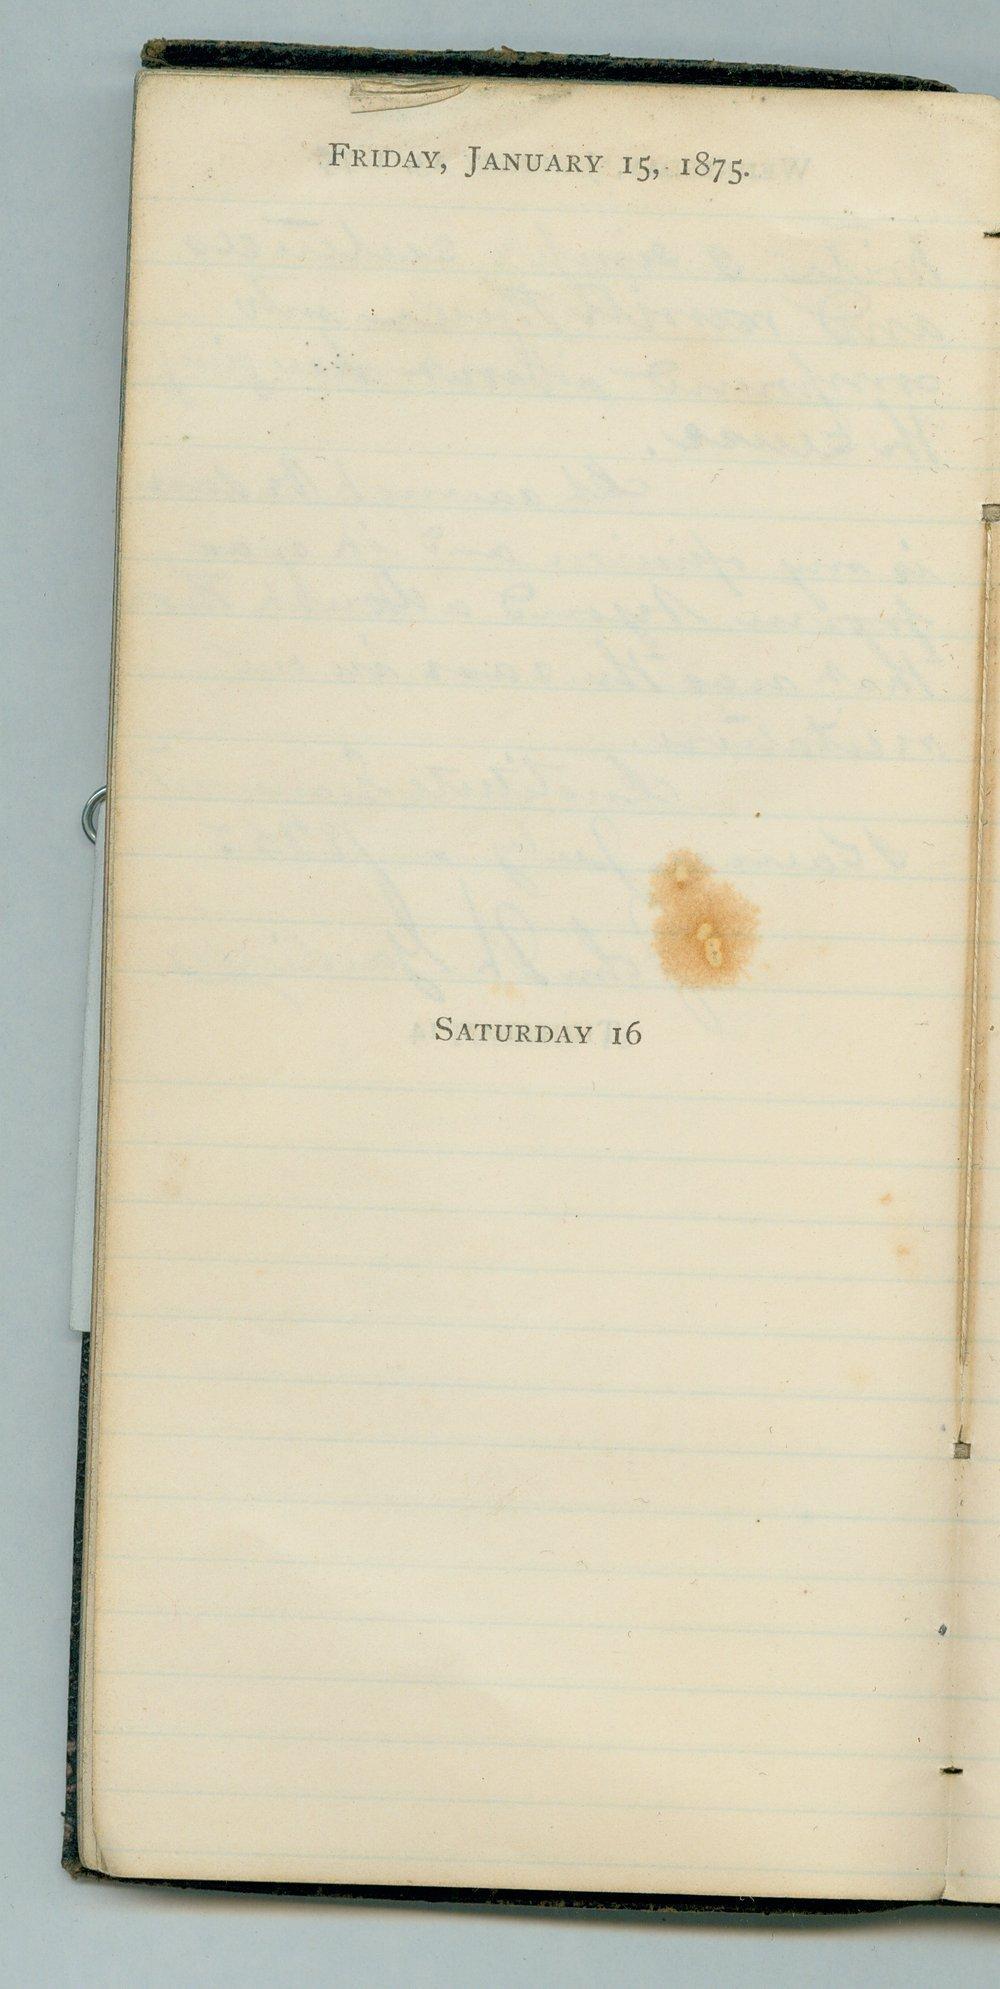 John William Gardiner diary - Jan 15, 1875